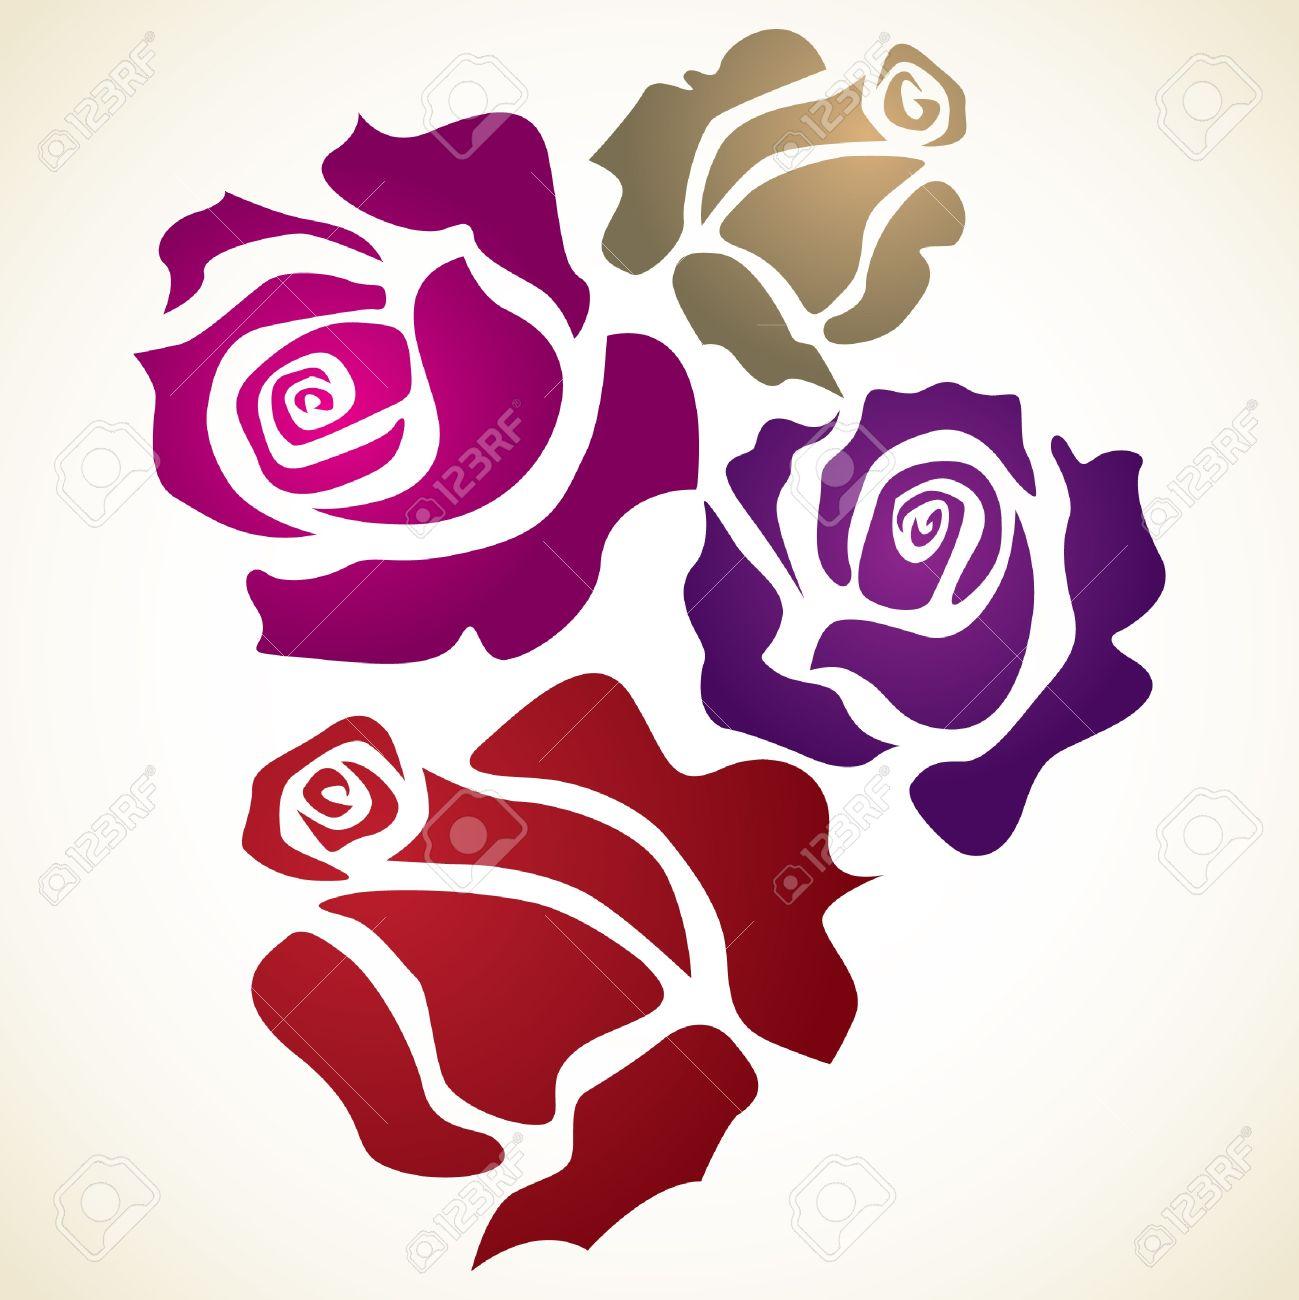 Four Color Flower Rose - Sketch Illustration Royalty Free Cliparts ...